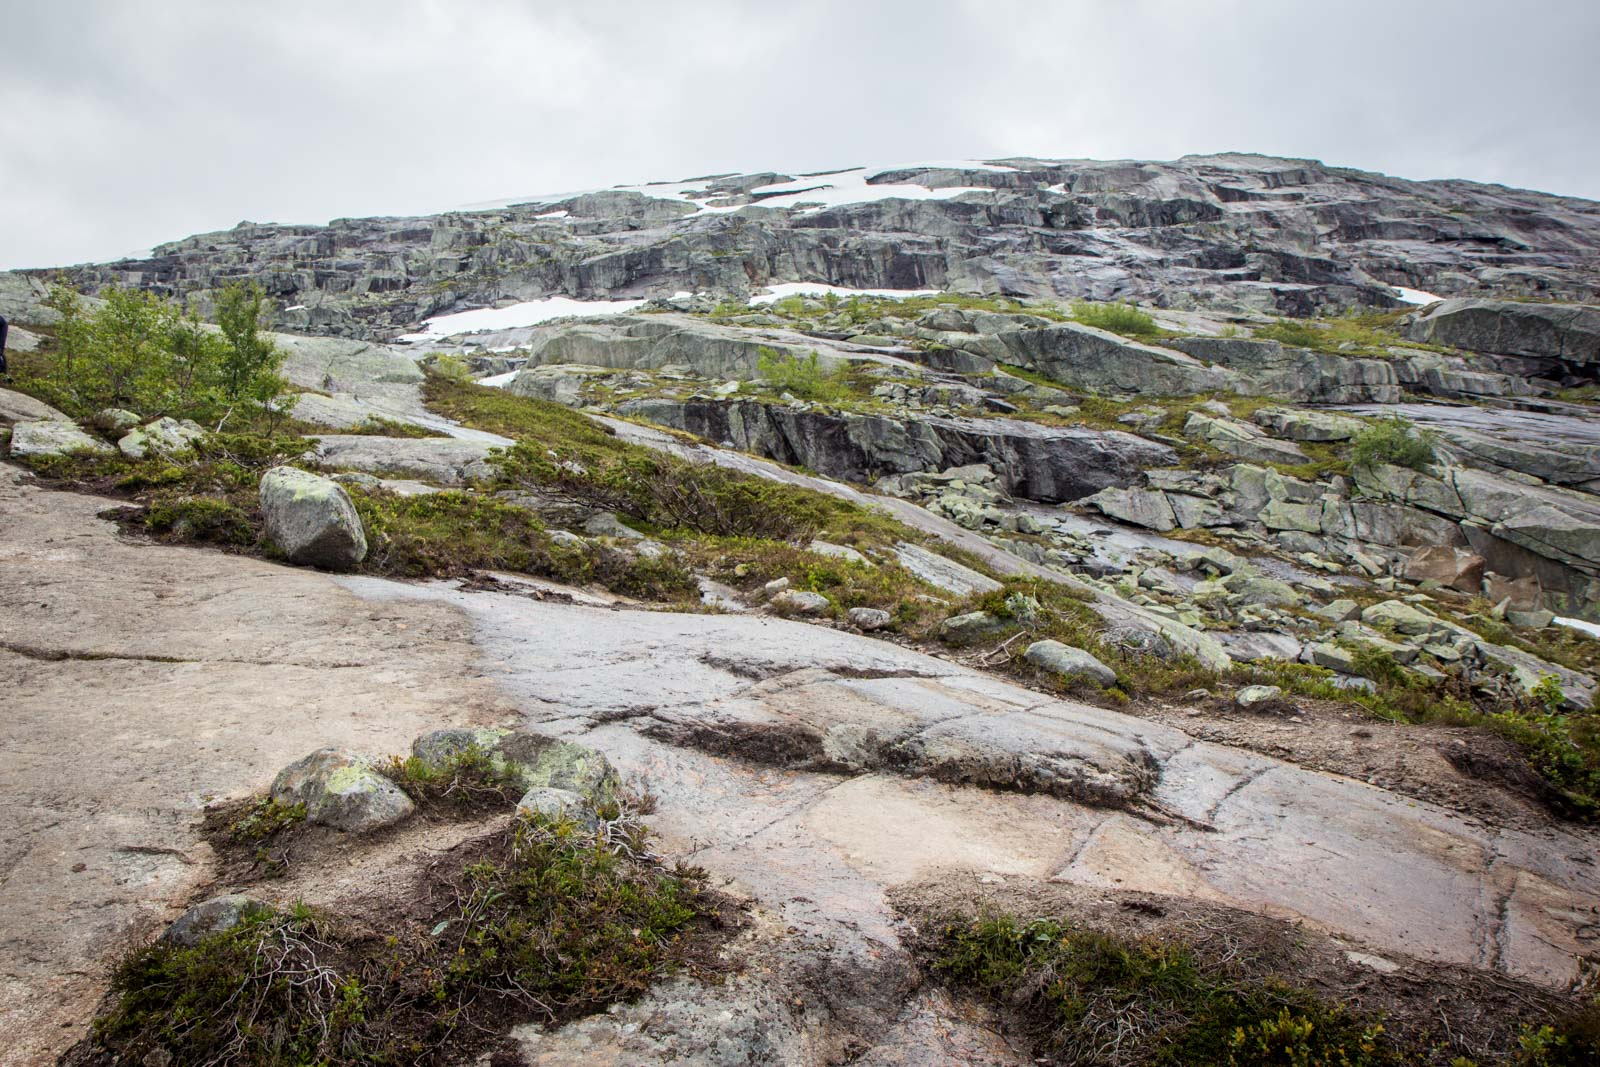 Photos of Trolltunga, Norway